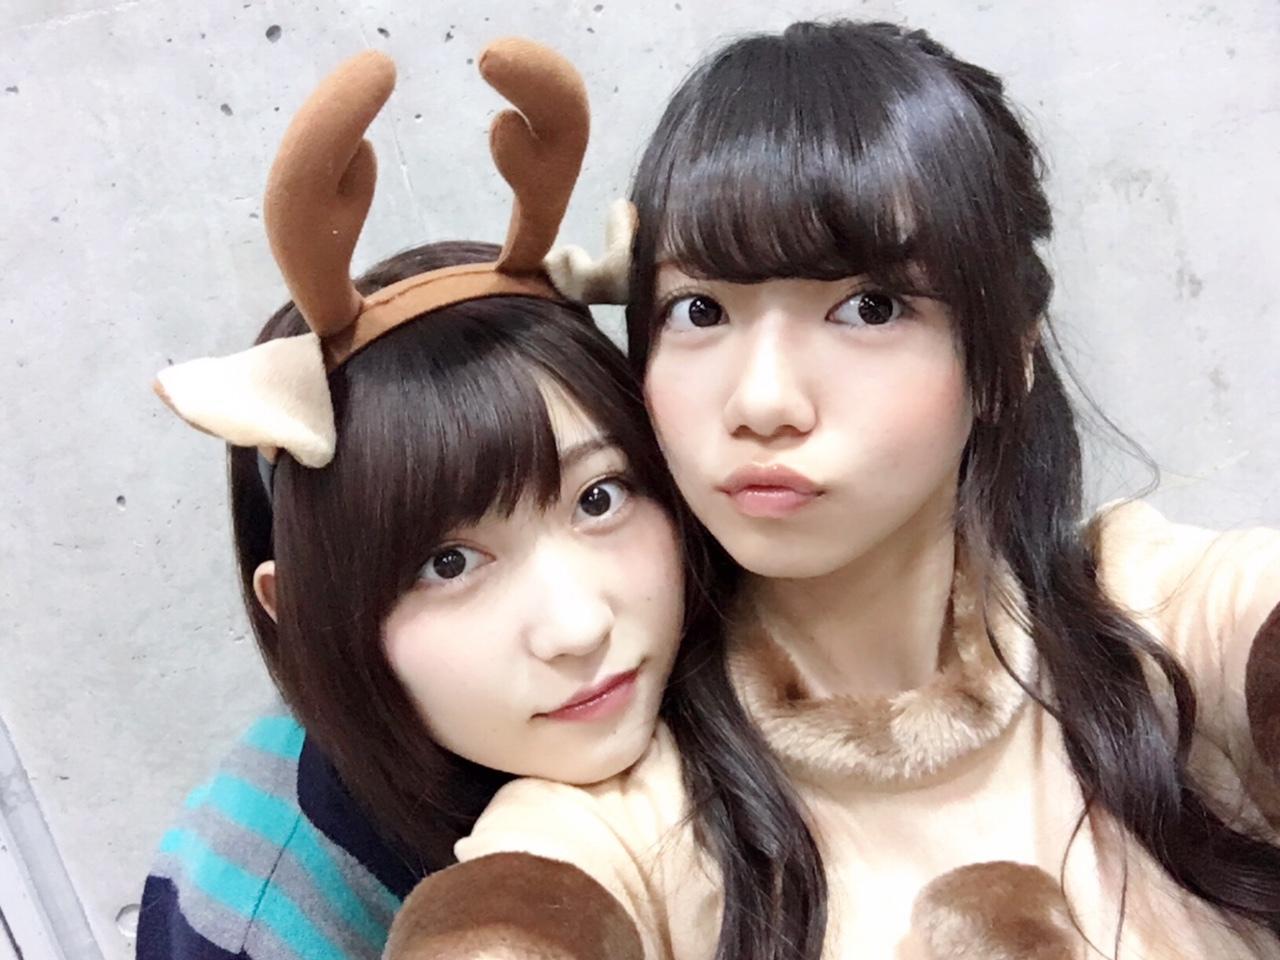 http://cdn.keyakizaka46.com/files/14/diary/k46/member/moblog/201711/mob03a8kQ.jpg